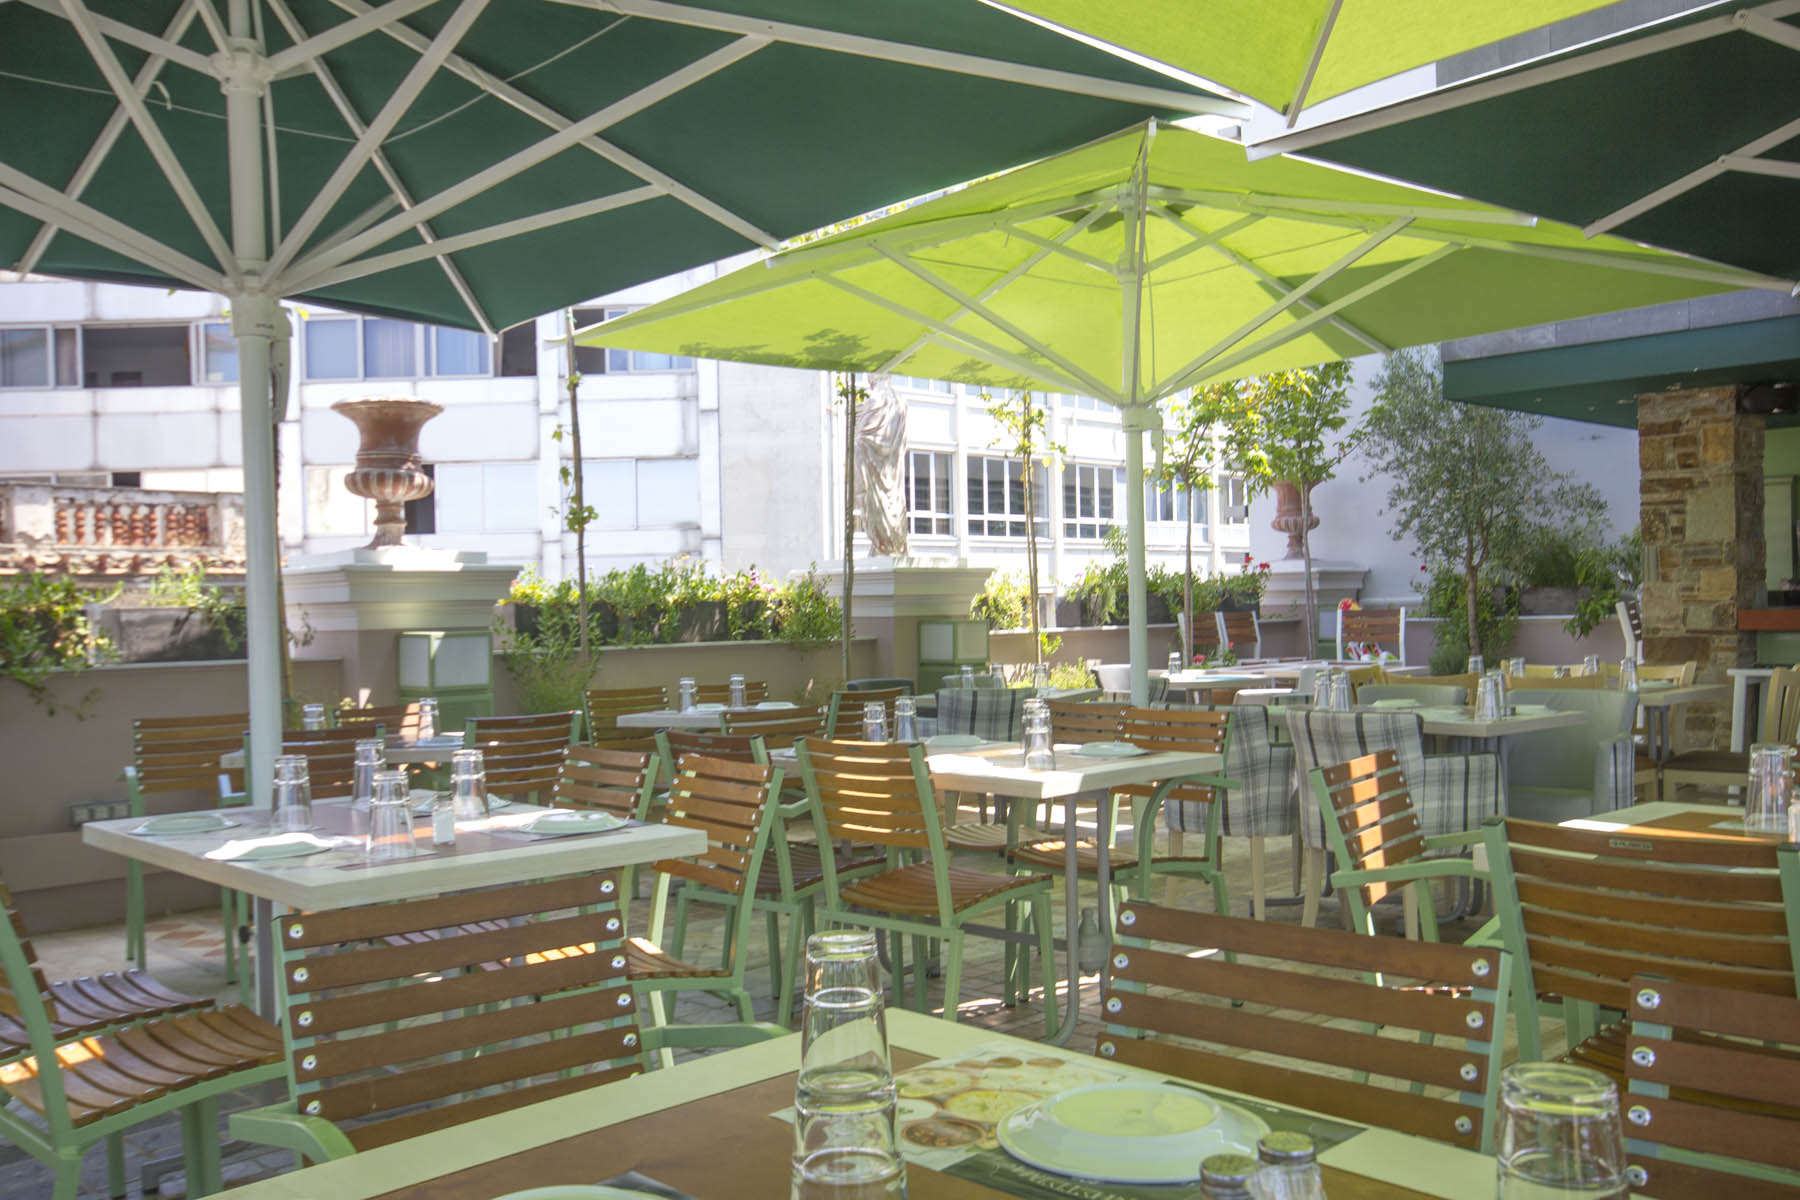 Roof garden bars restaurants with acropolis view in for Acropolis cuisine